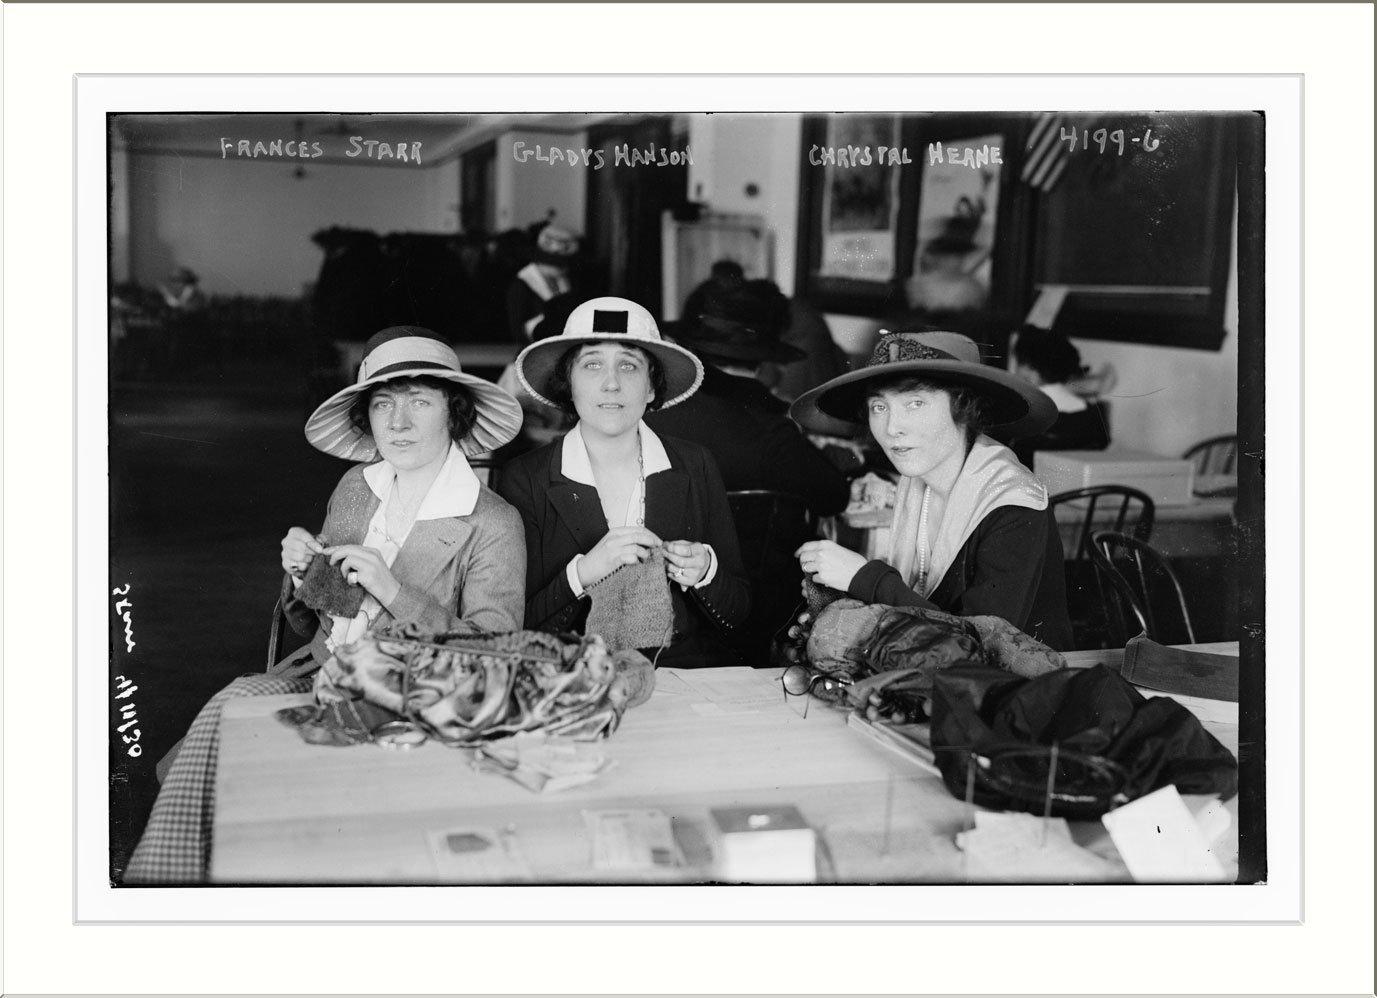 Gladys Hanson Gladys Hanson new pictures